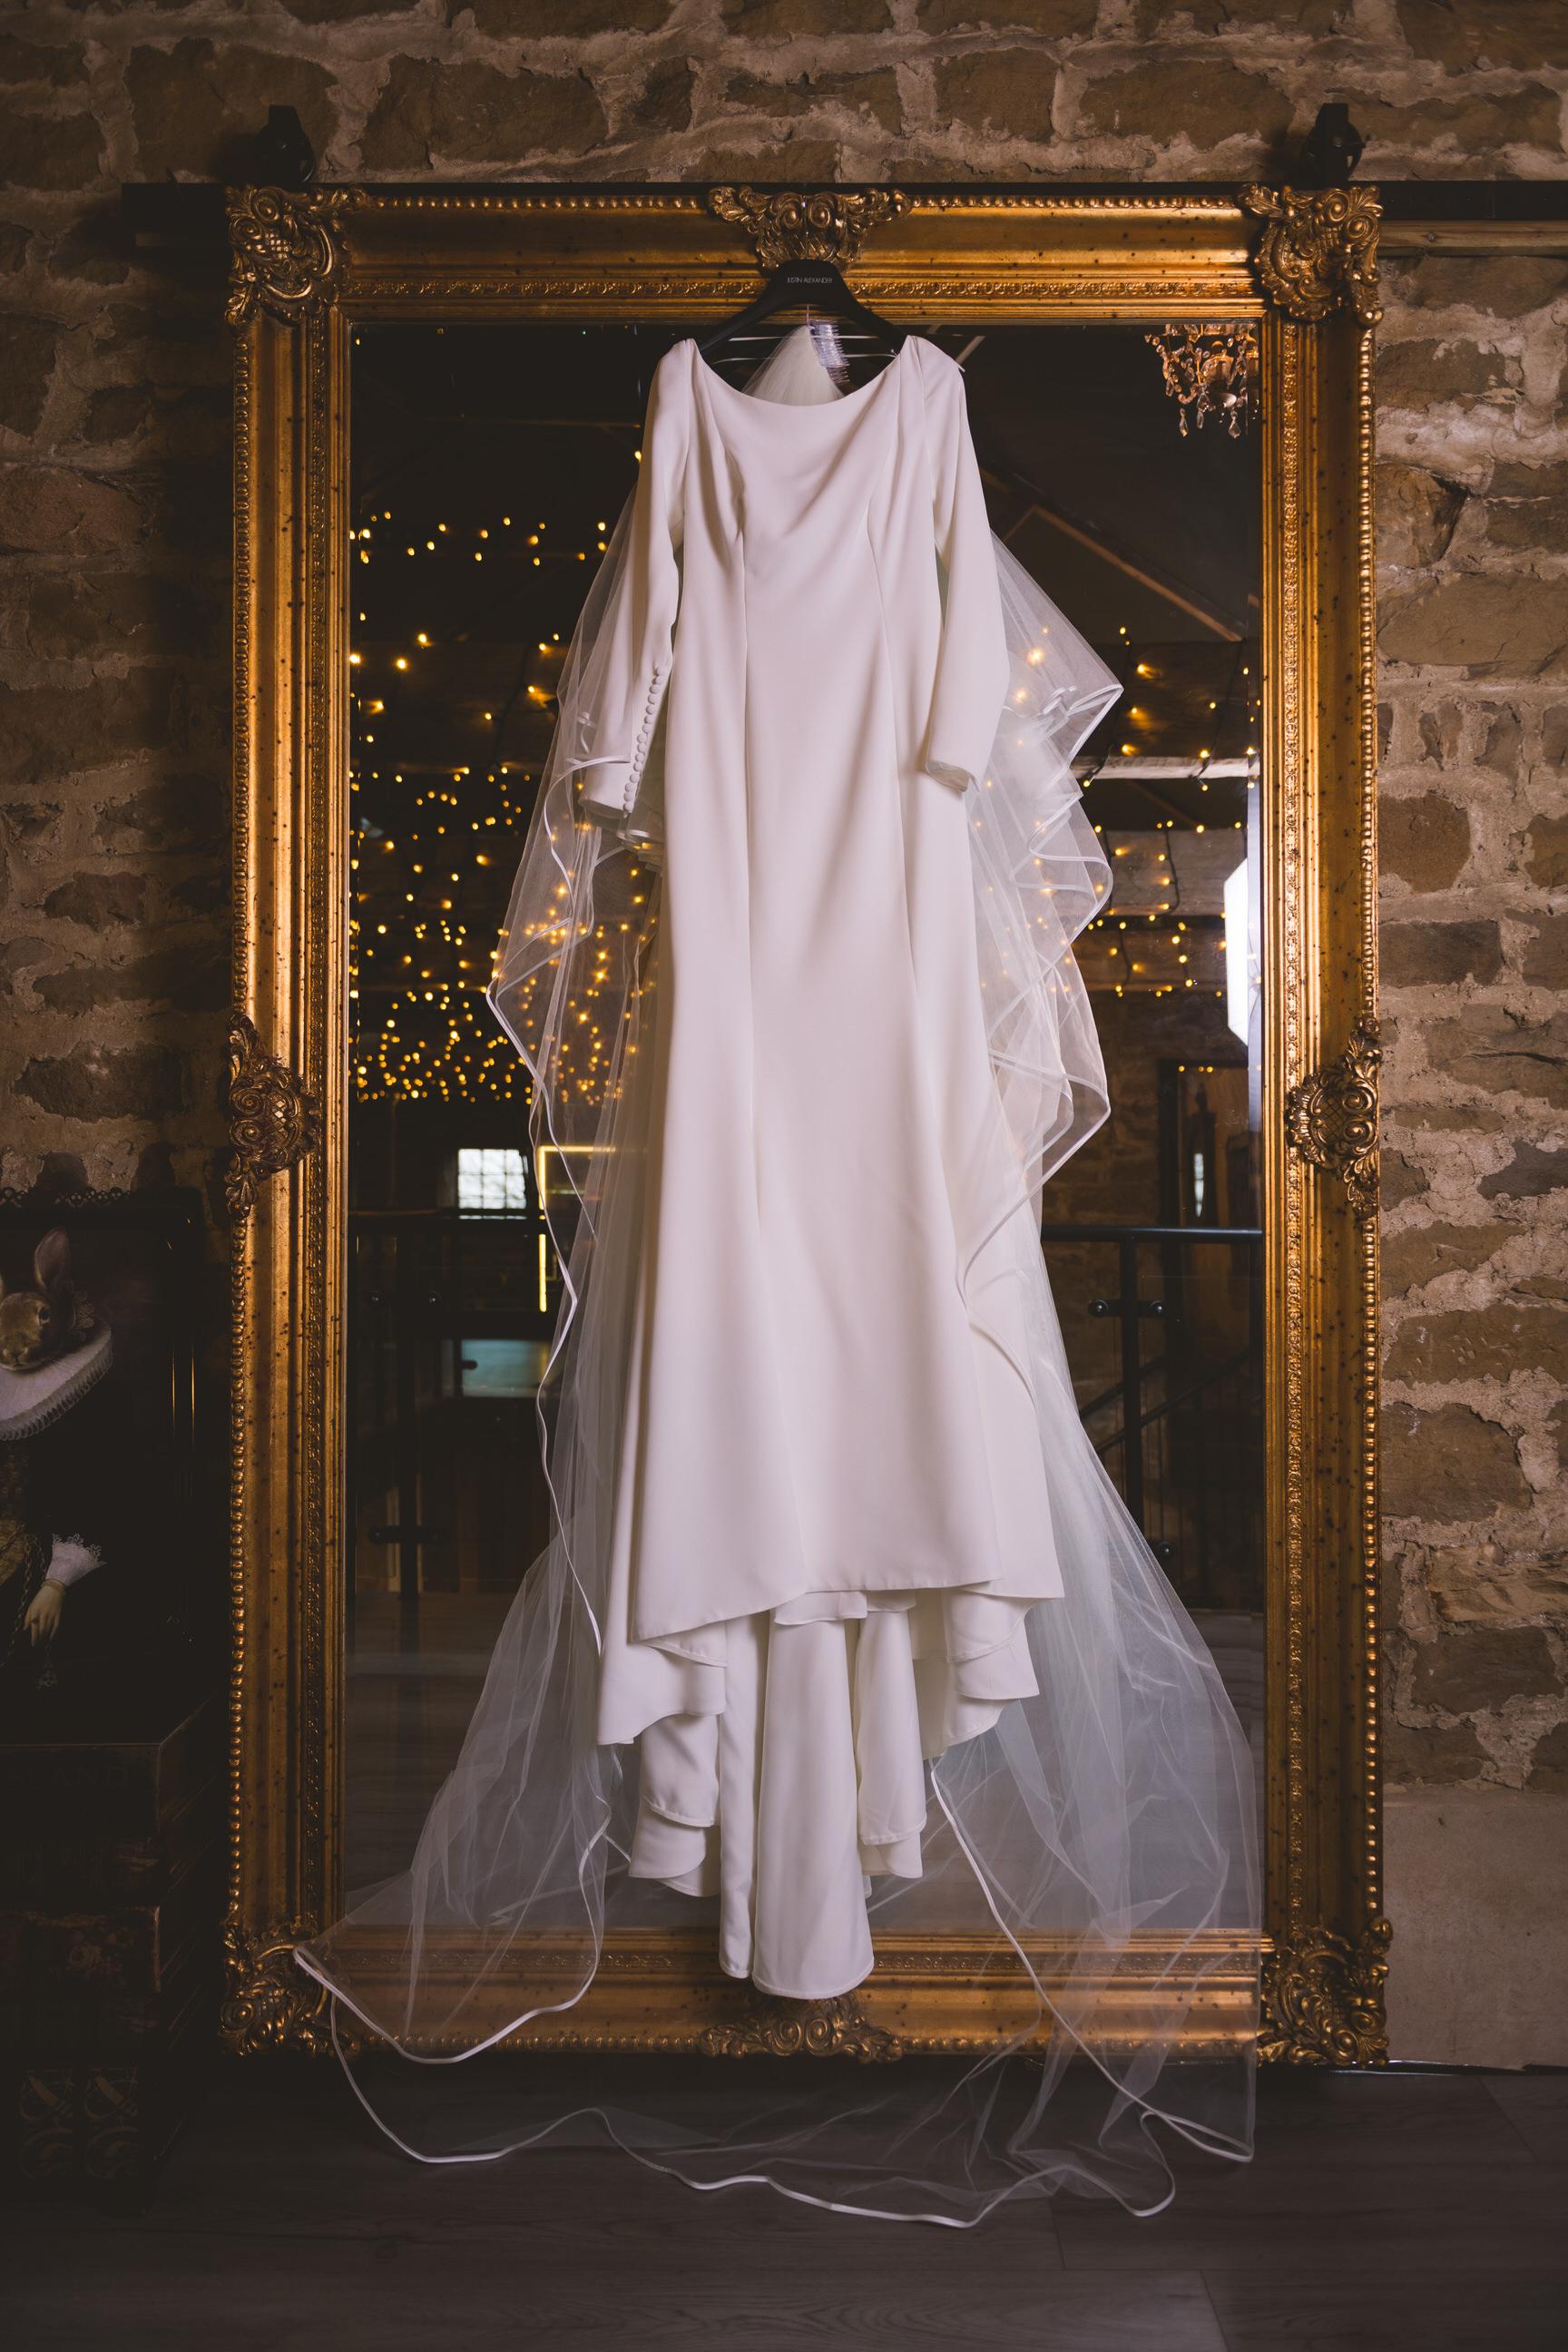 wharfedale-grange-harrogate-wedding-photographer-29.jpg